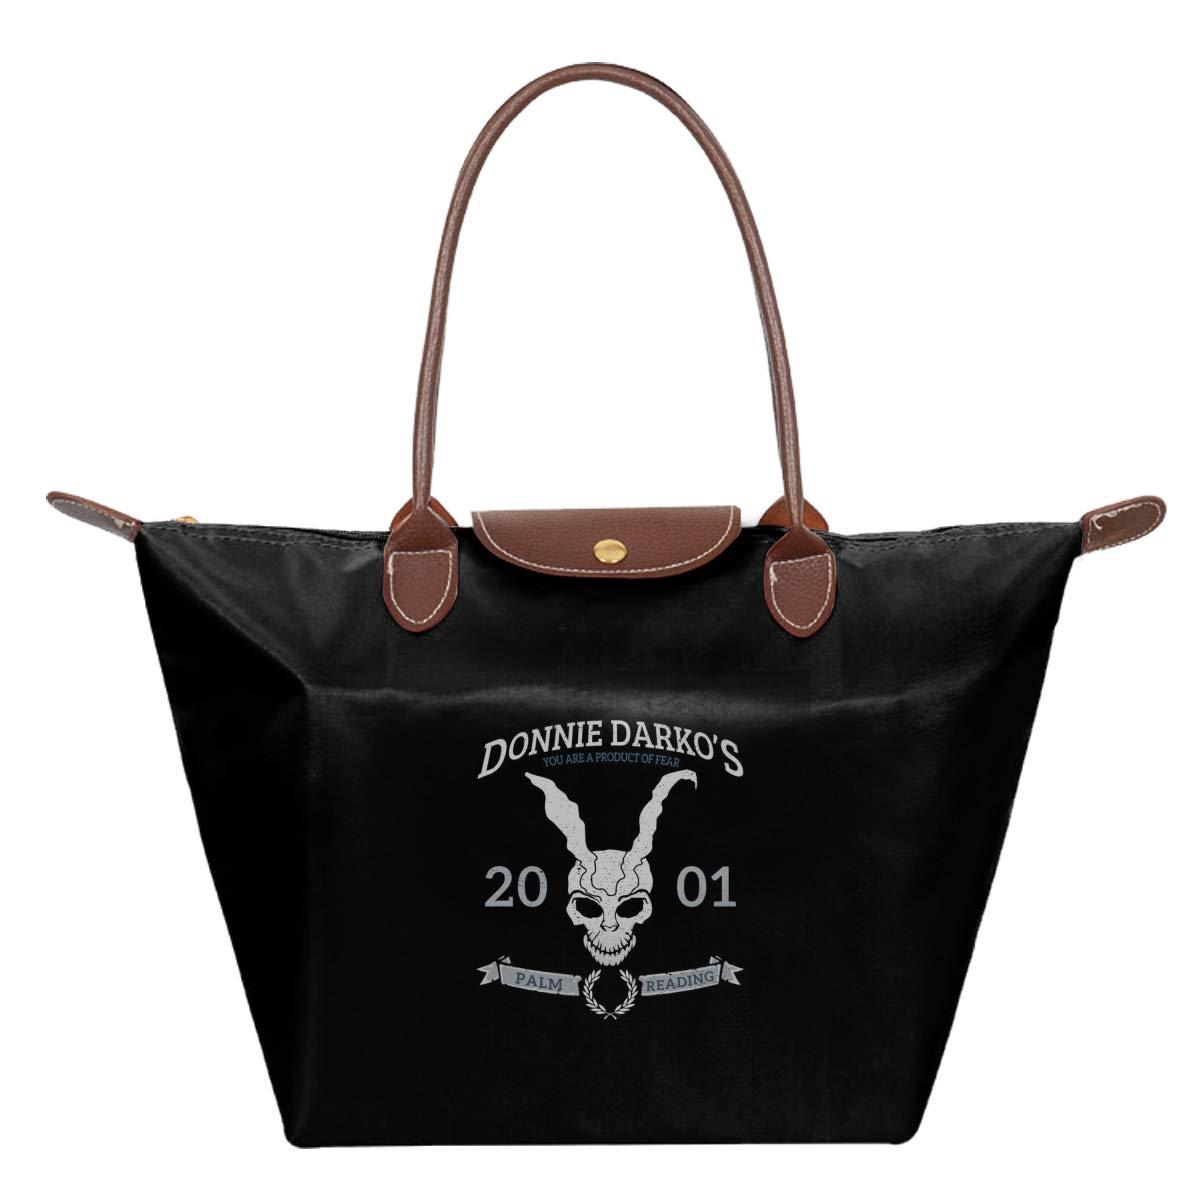 Donnie Darkos Palm Reading Waterproof Leather Folded Messenger Nylon Bag Travel Tote Hopping Folding School Handbags